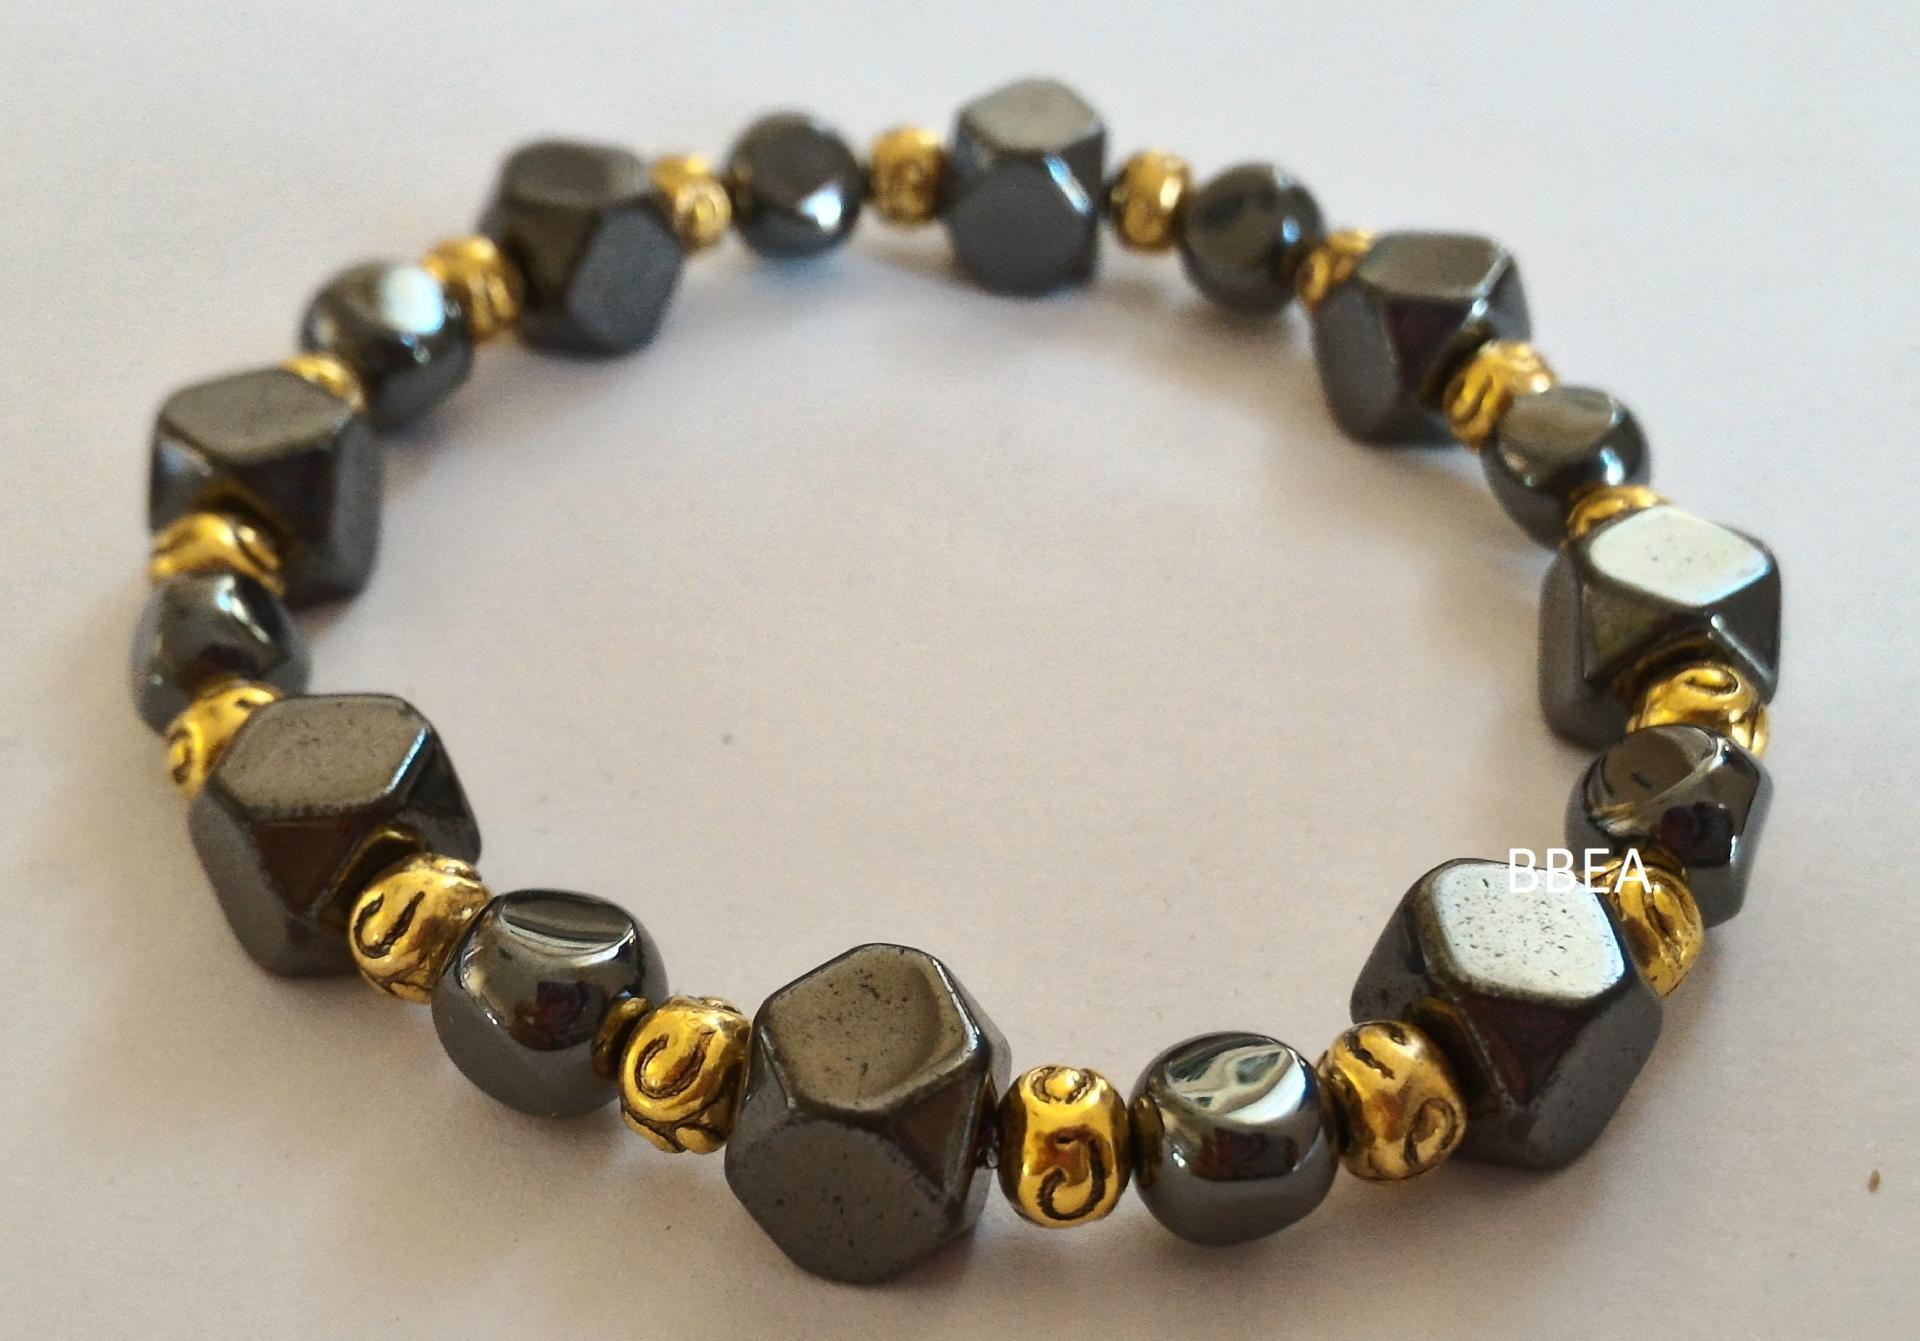 Bracelet hematite 4 2